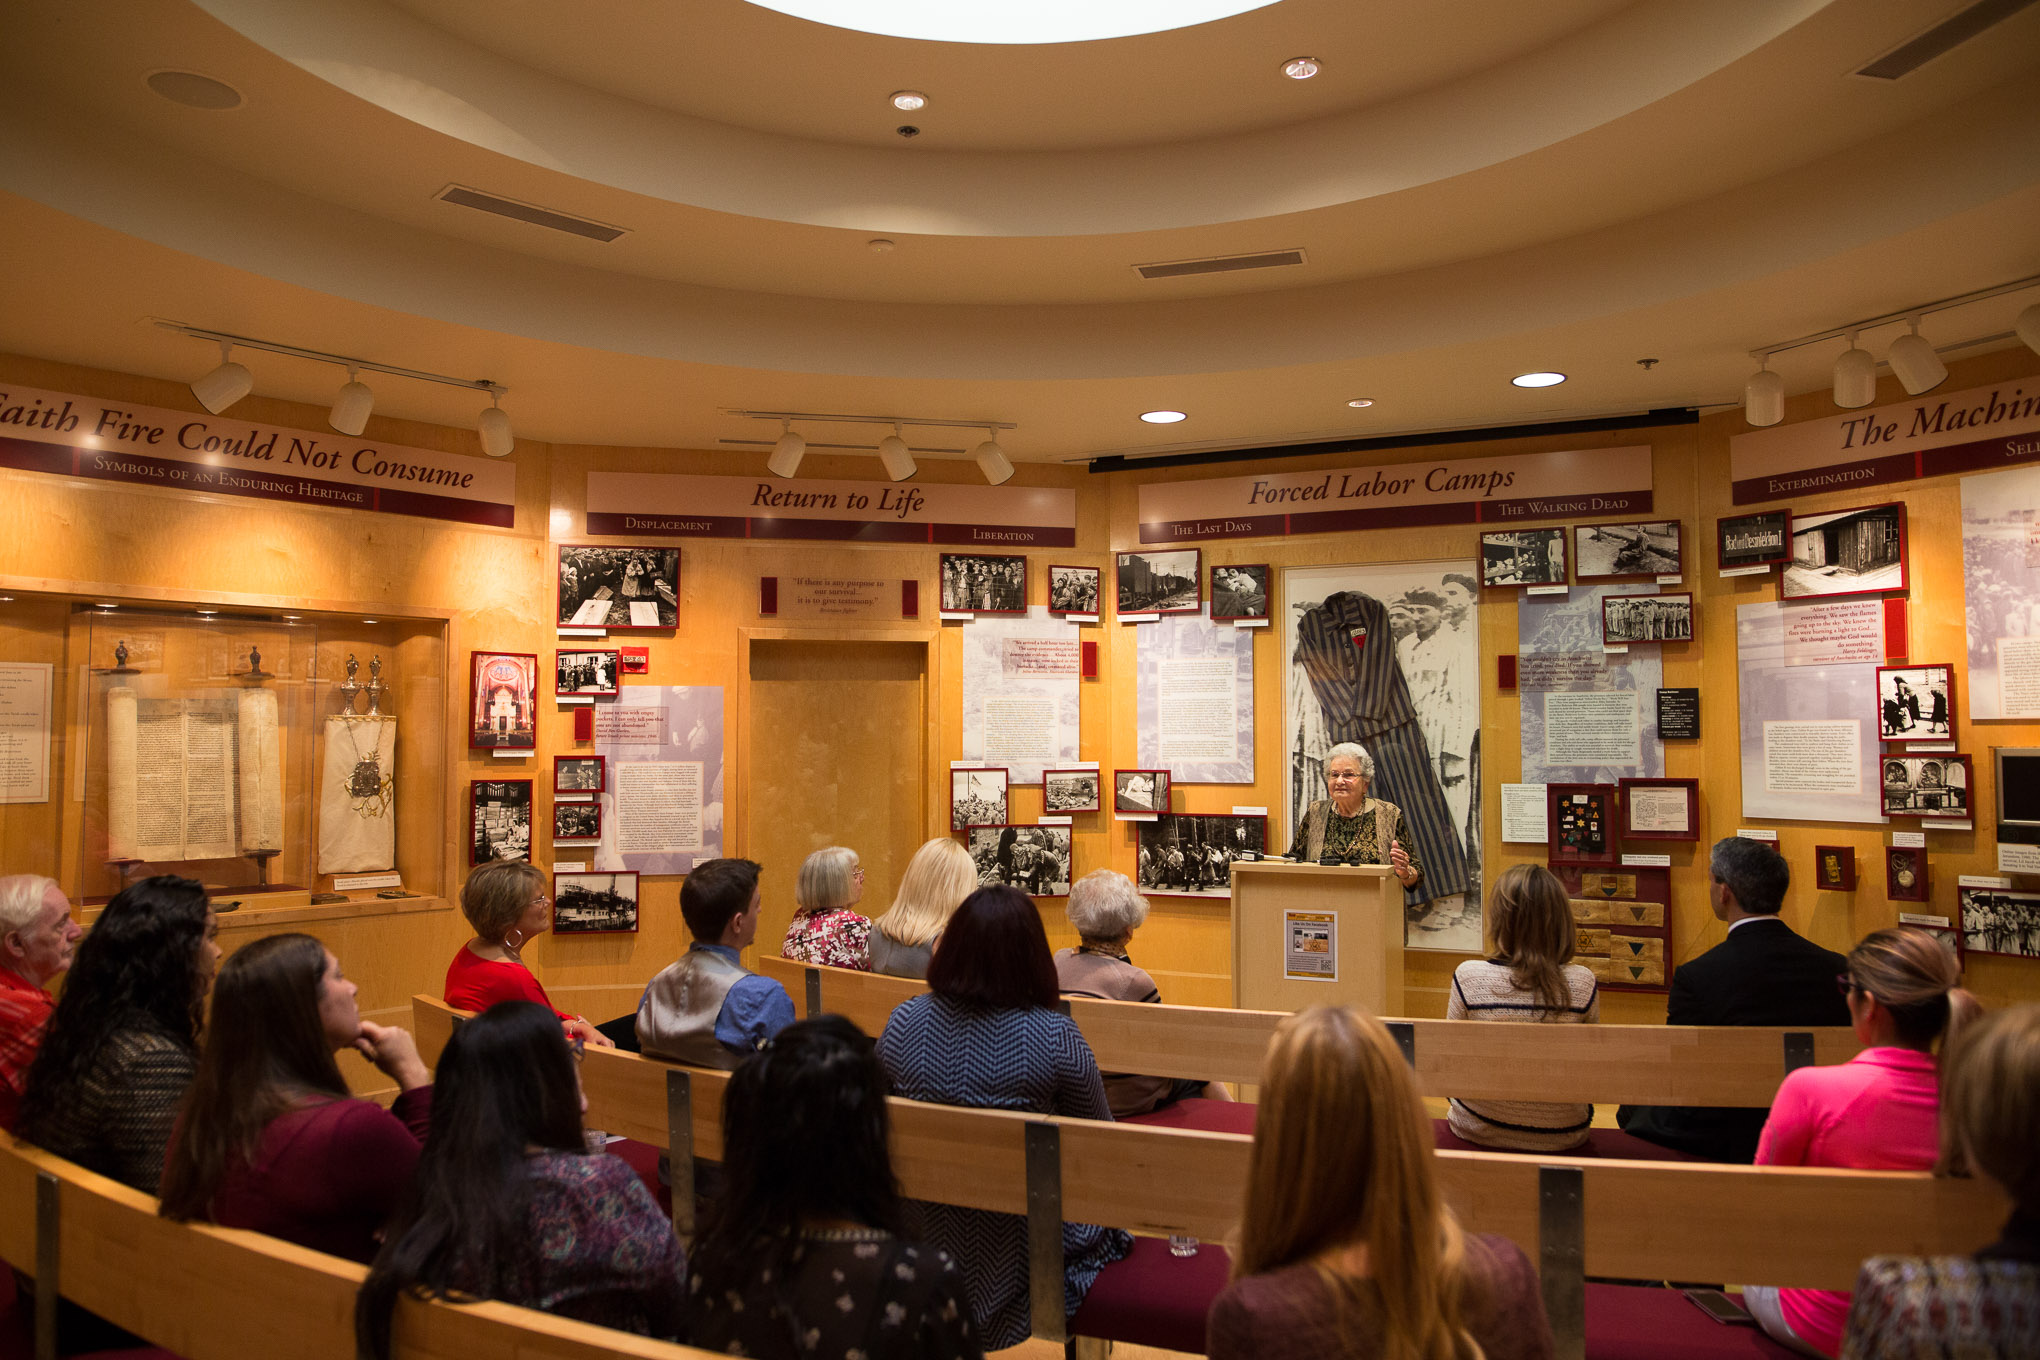 Holocaust survivor Anna Rado speaks to members of the press announcement in the Holocaust Memorial Museum.